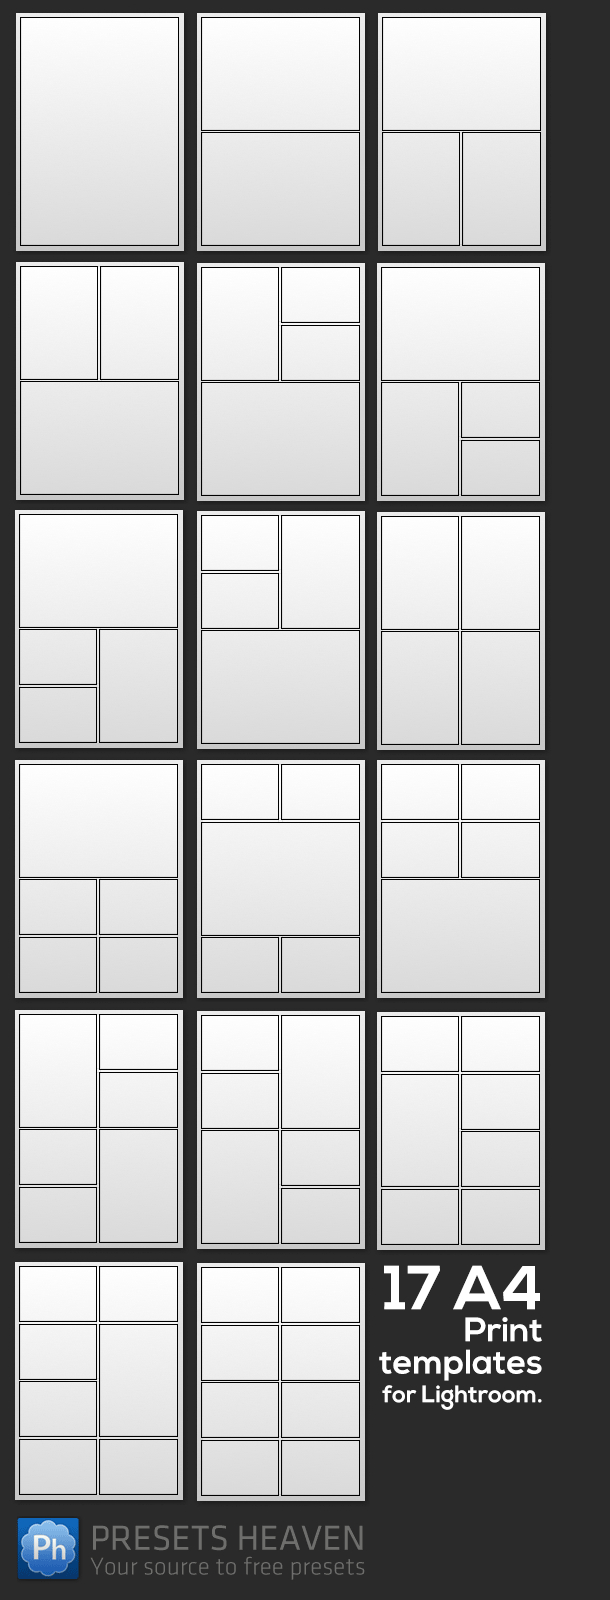 17 Free Print Templates For Lightroom   Free Lightroom Stuff - Free Printable Photo Collage Template